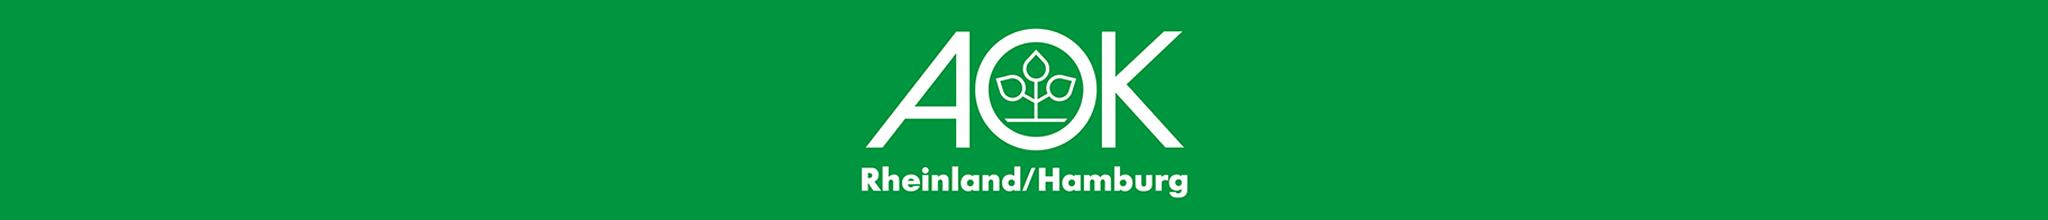 AOK-Header-Banner